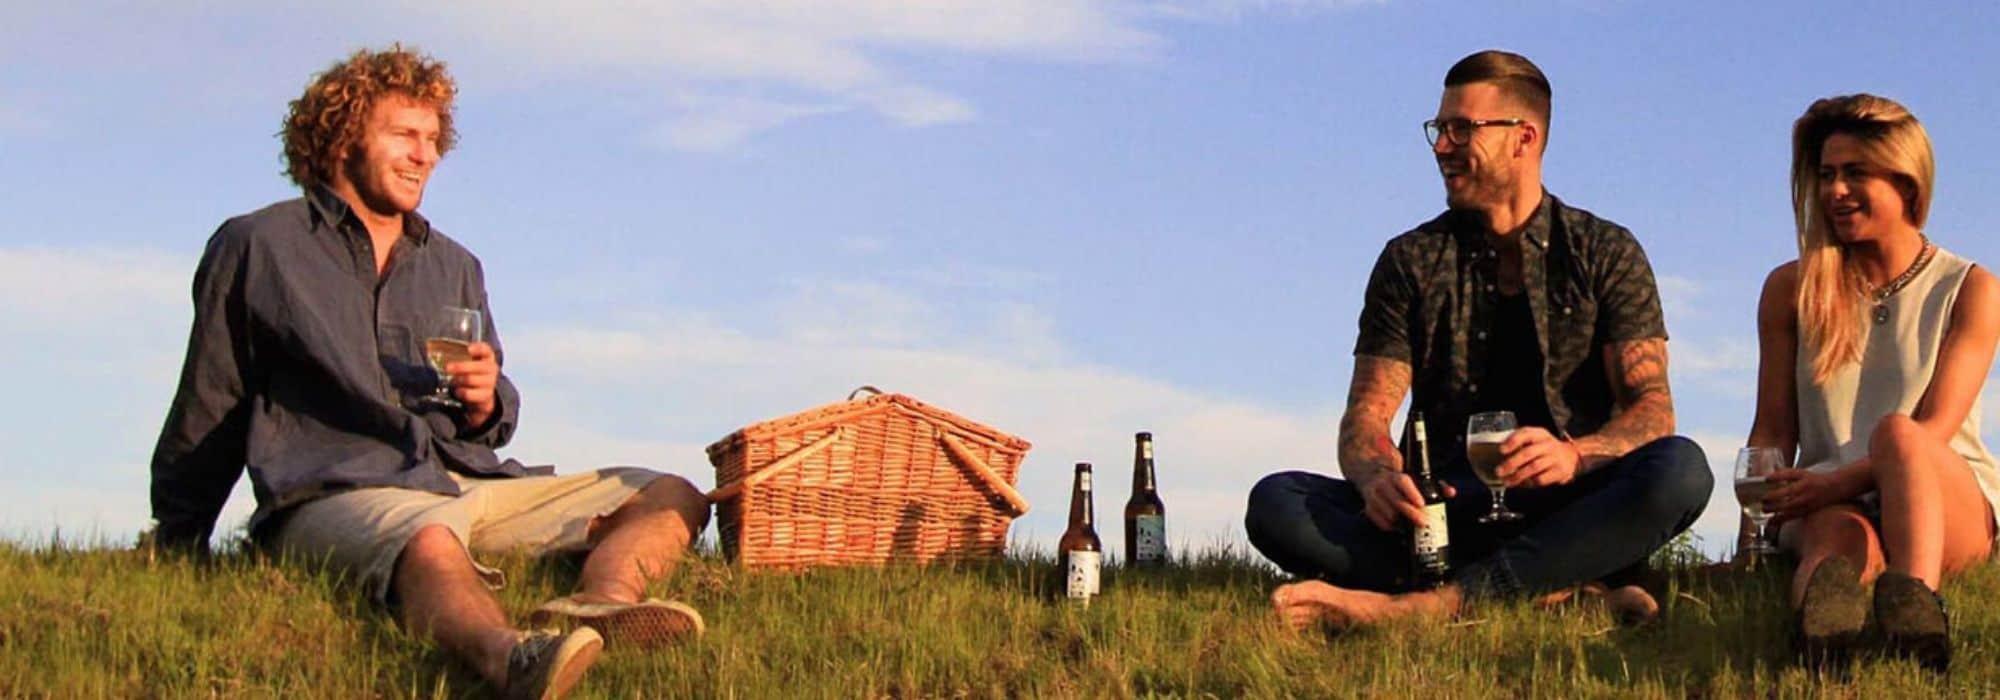 Hawke's Bay's Best Summer Breweries, Cideriesand Wineries